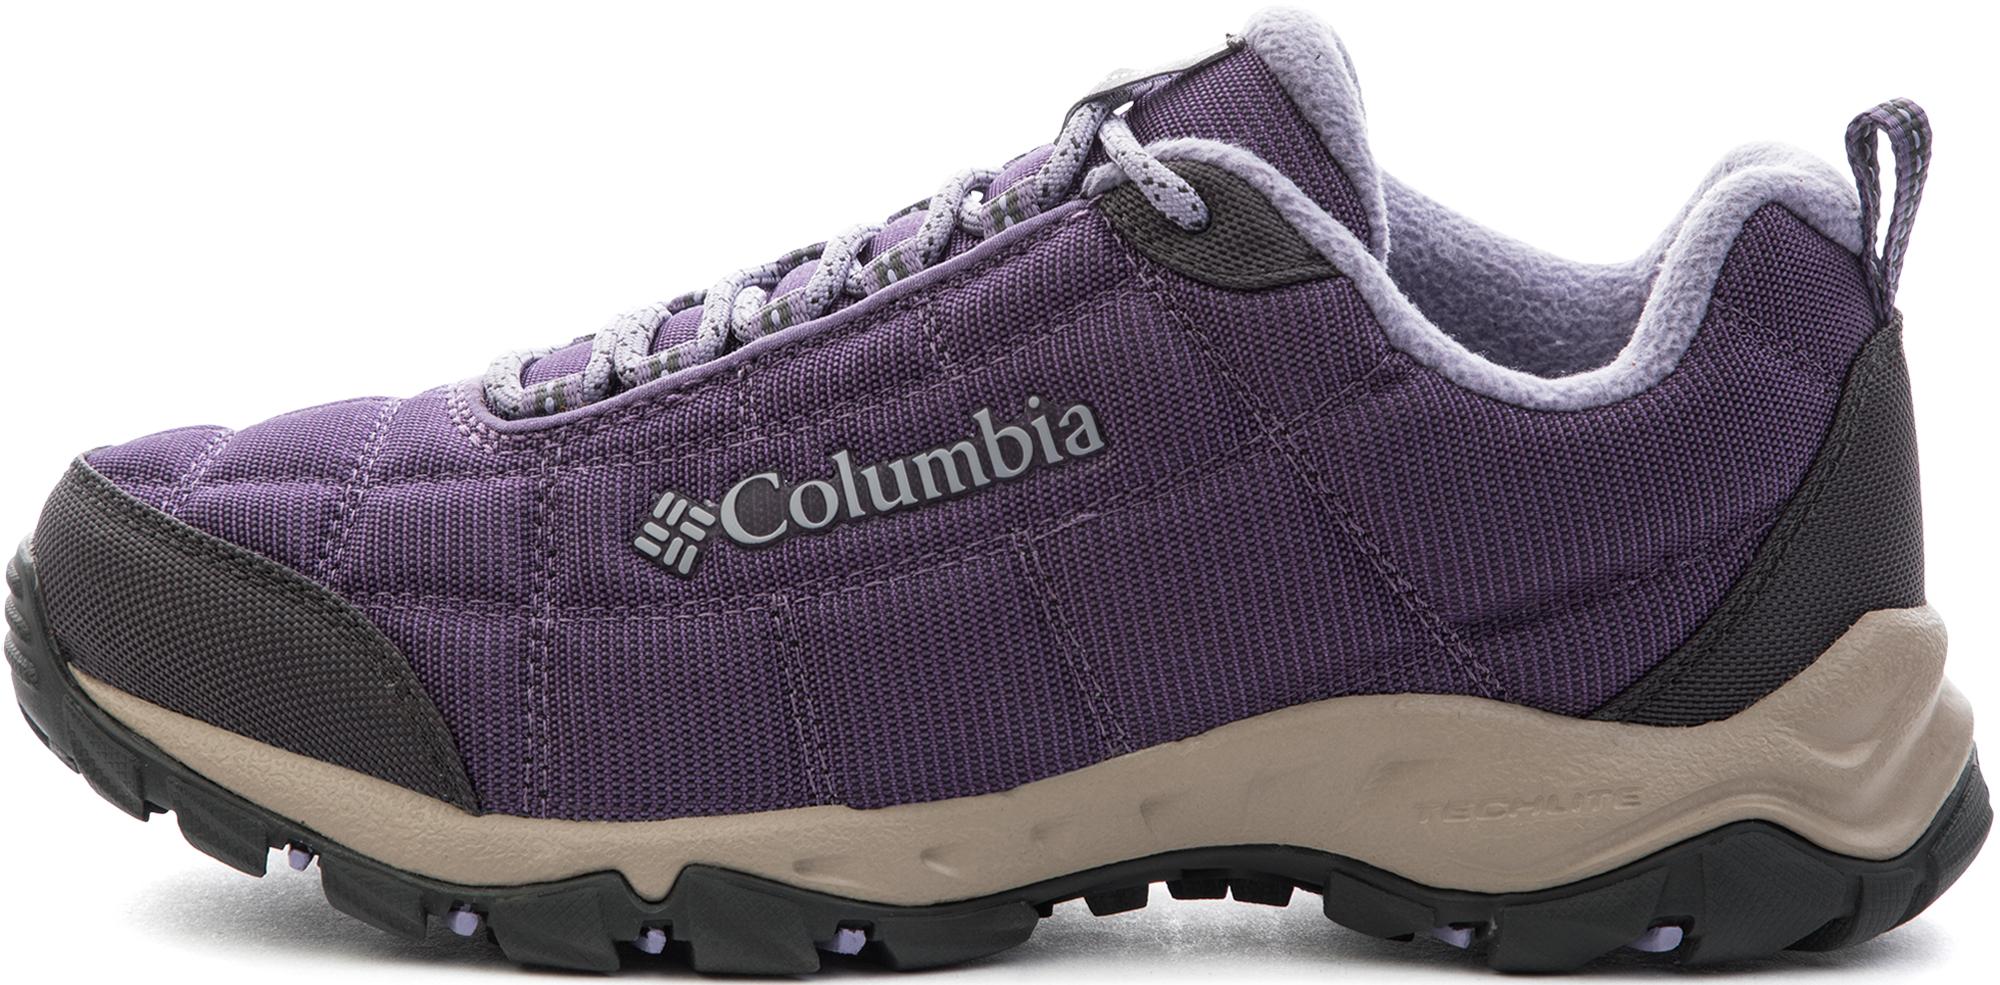 Columbia Ботинки женские Columbia Firecamp, размер 39 columbia ботинки утепленные мужские columbia firecamp размер 43